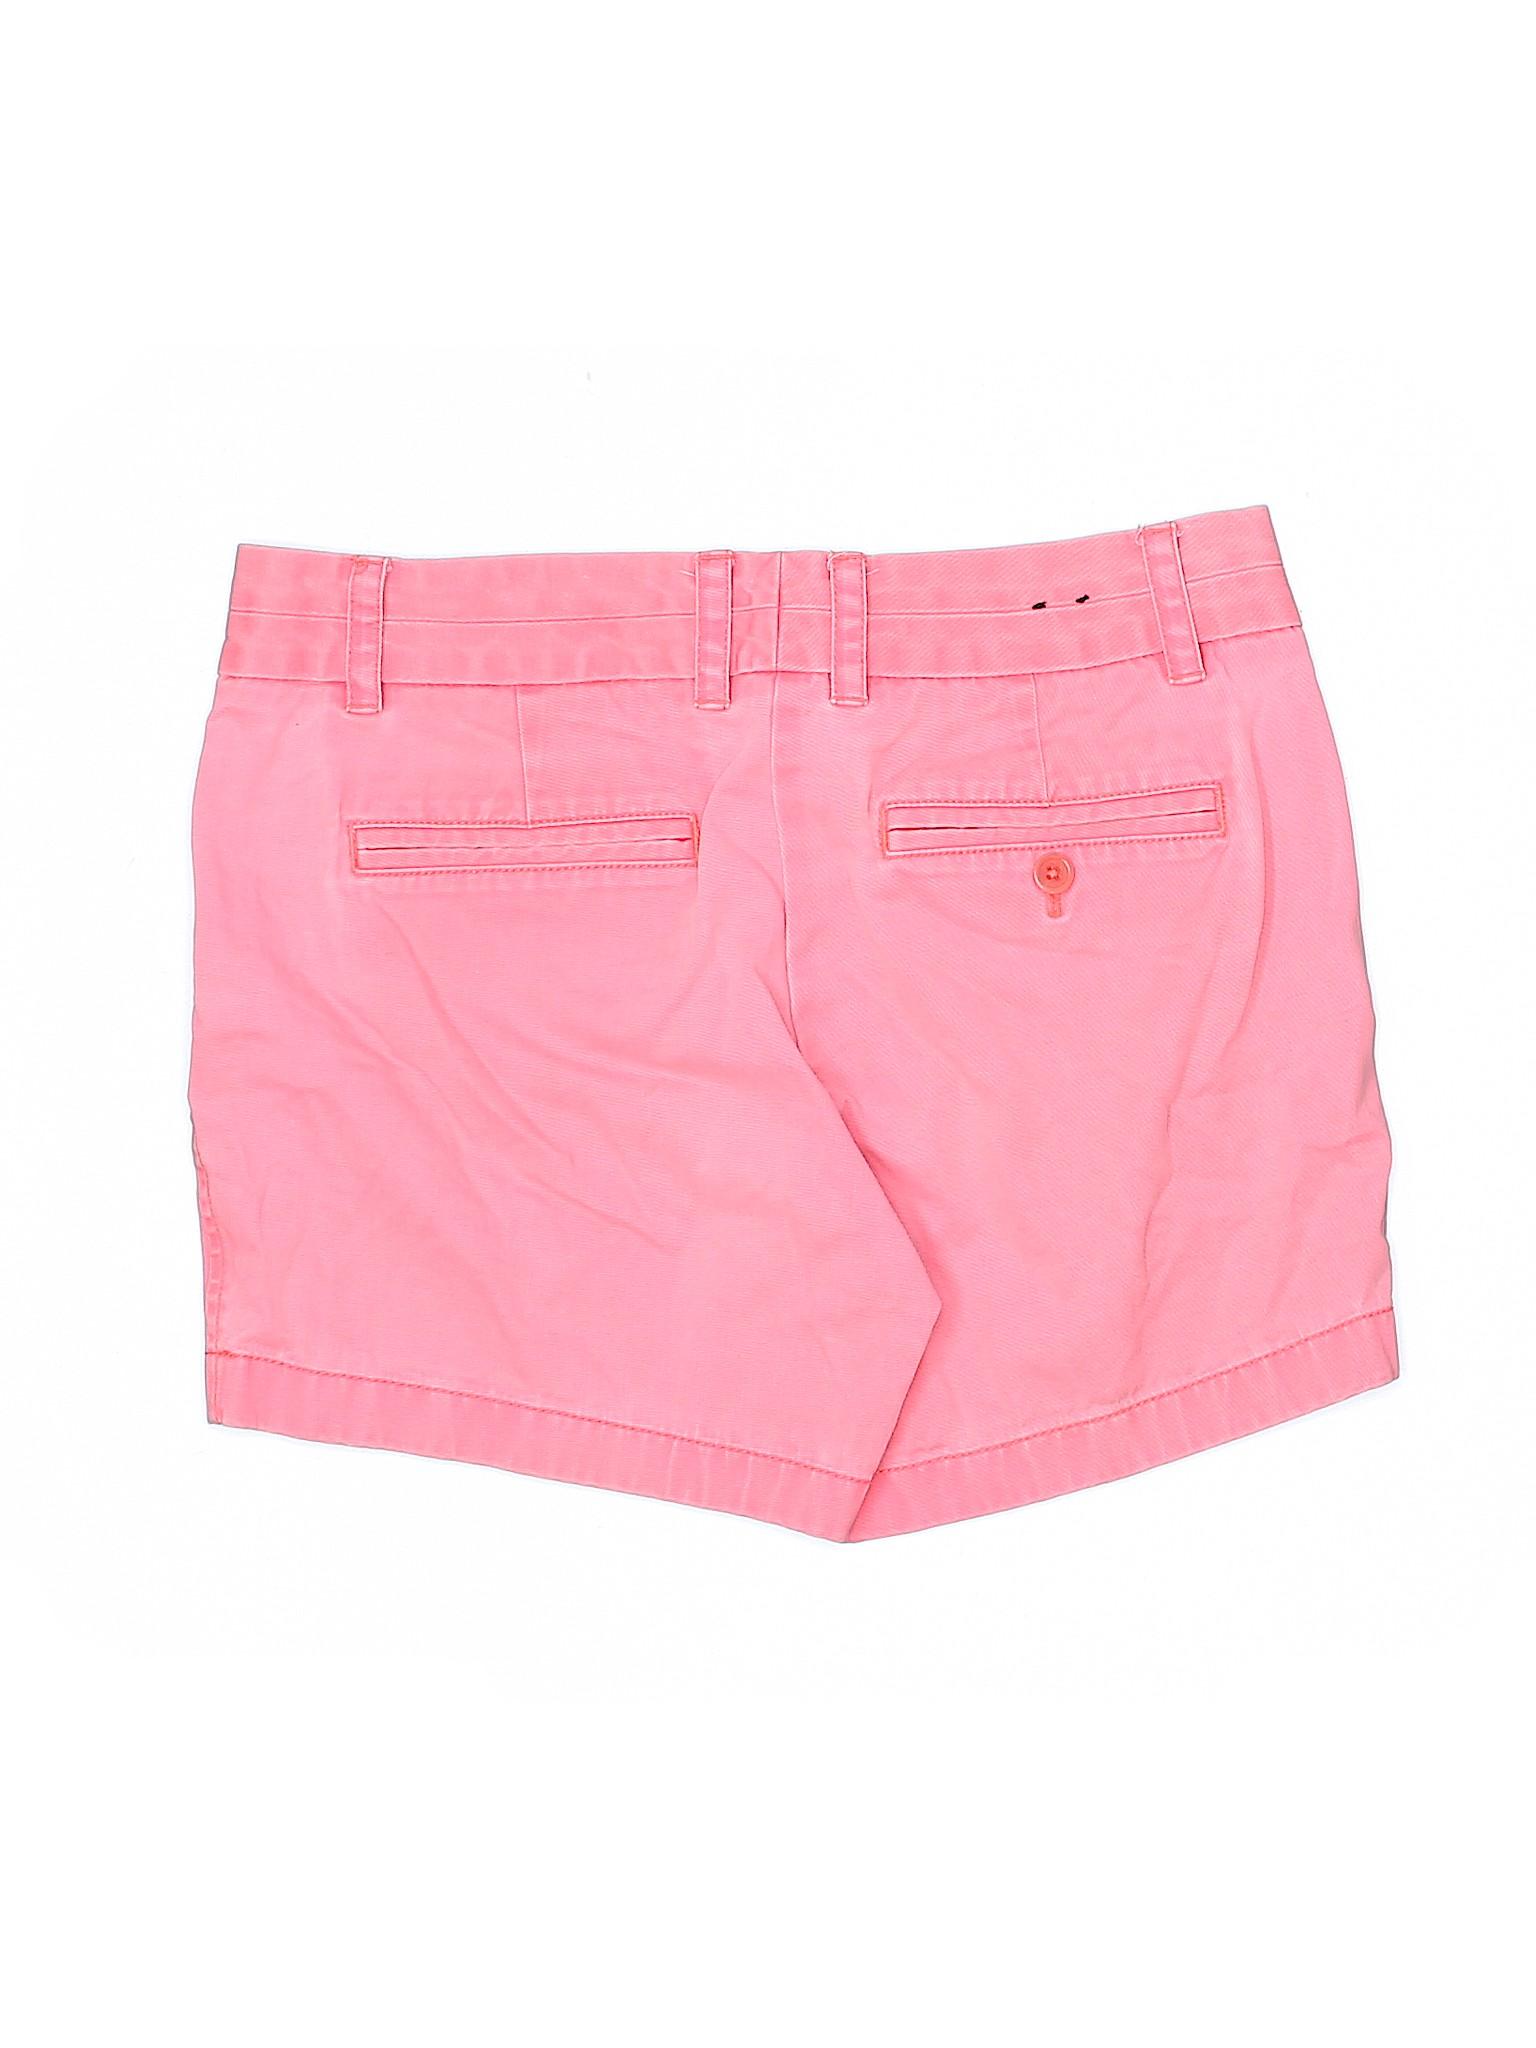 Crew Khaki Khaki Shorts Crew J Boutique Boutique J Shorts Rx6zwdqx